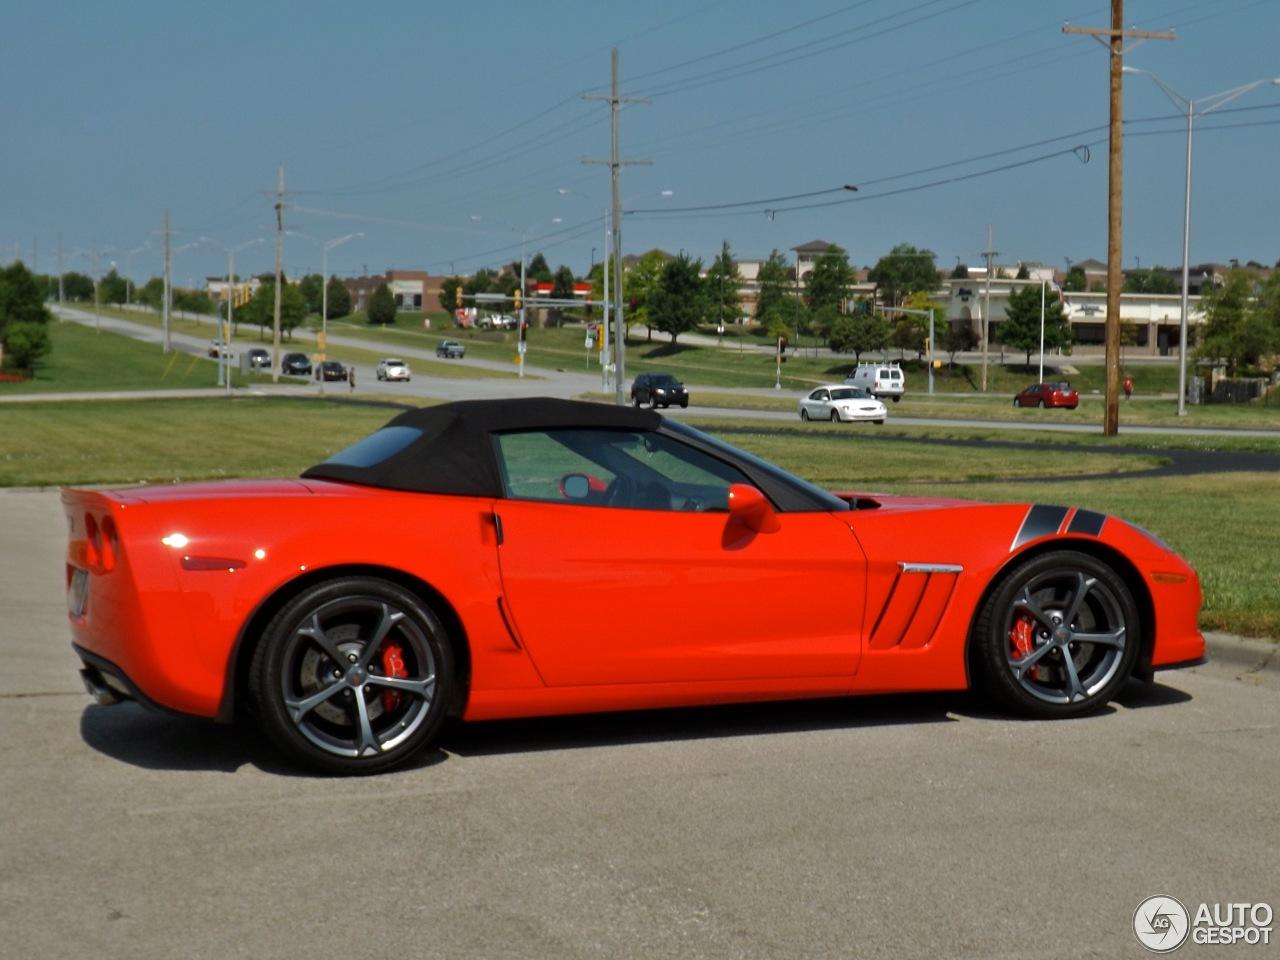 chevrolet corvette c6 grand sport convertible 8 december 2013 autogespot. Black Bedroom Furniture Sets. Home Design Ideas